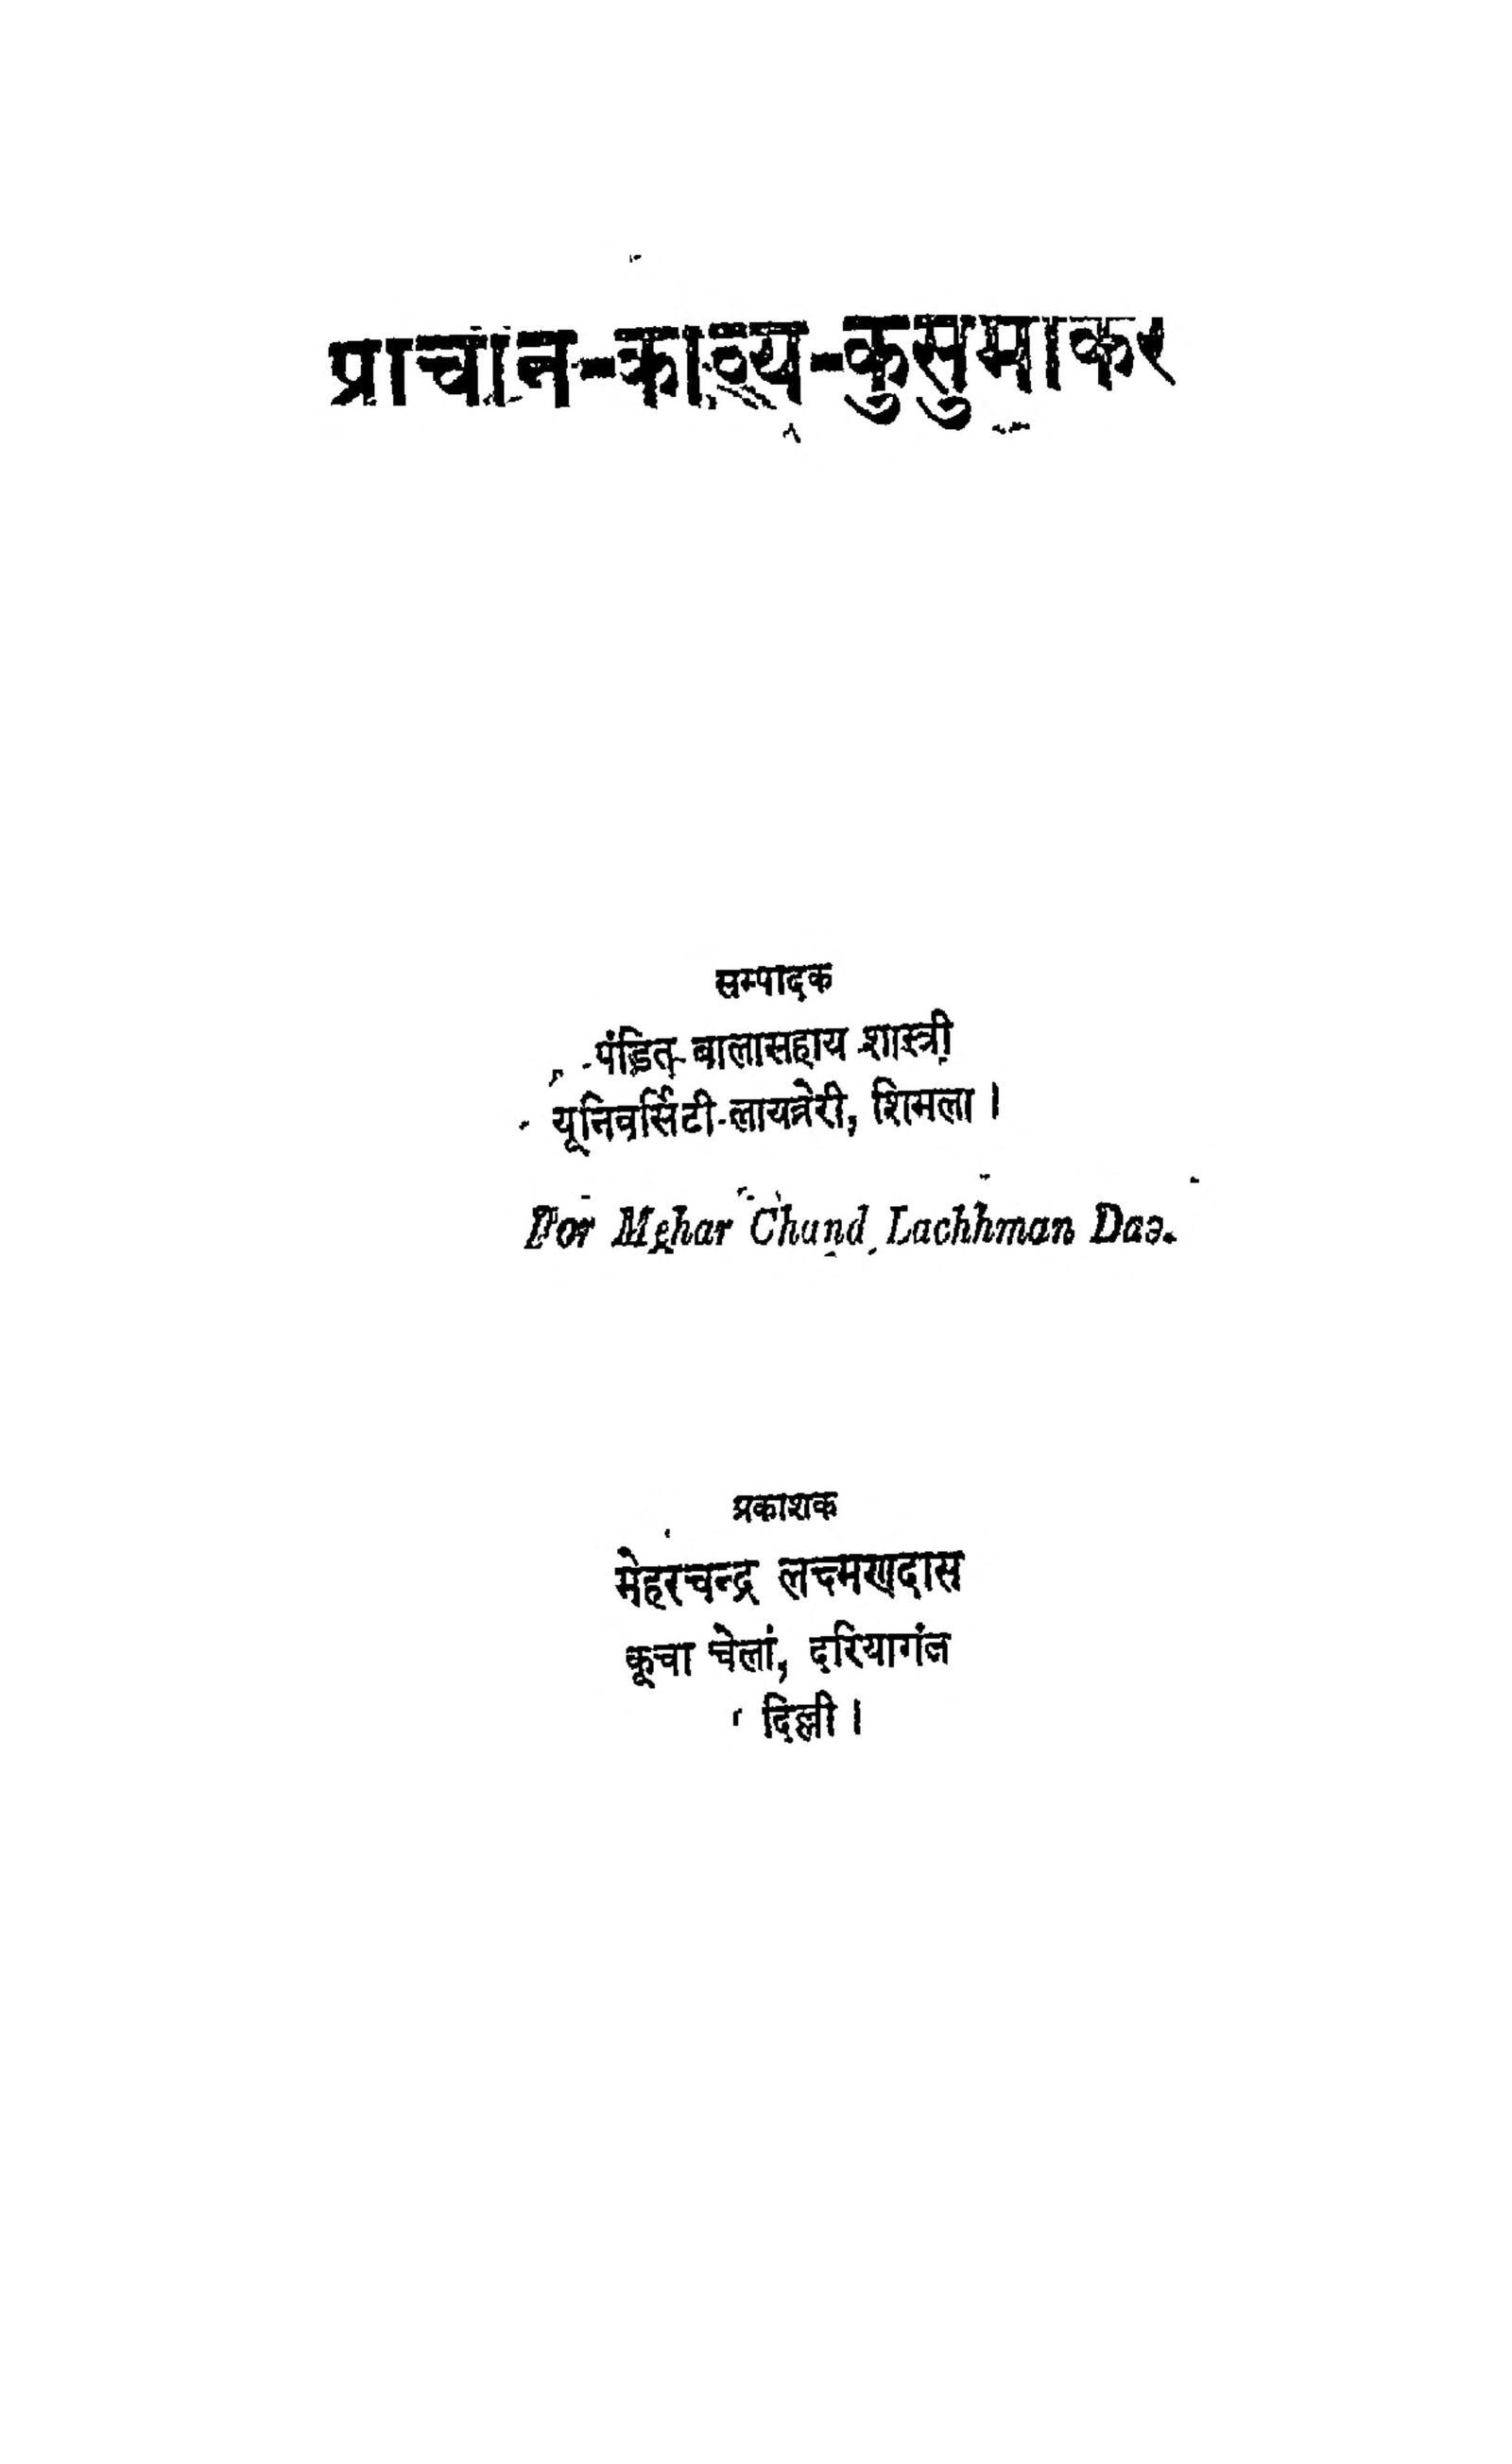 Pracheen Kavya Kusmakar by बालासहाय शास्त्री - Balasahay Shastri